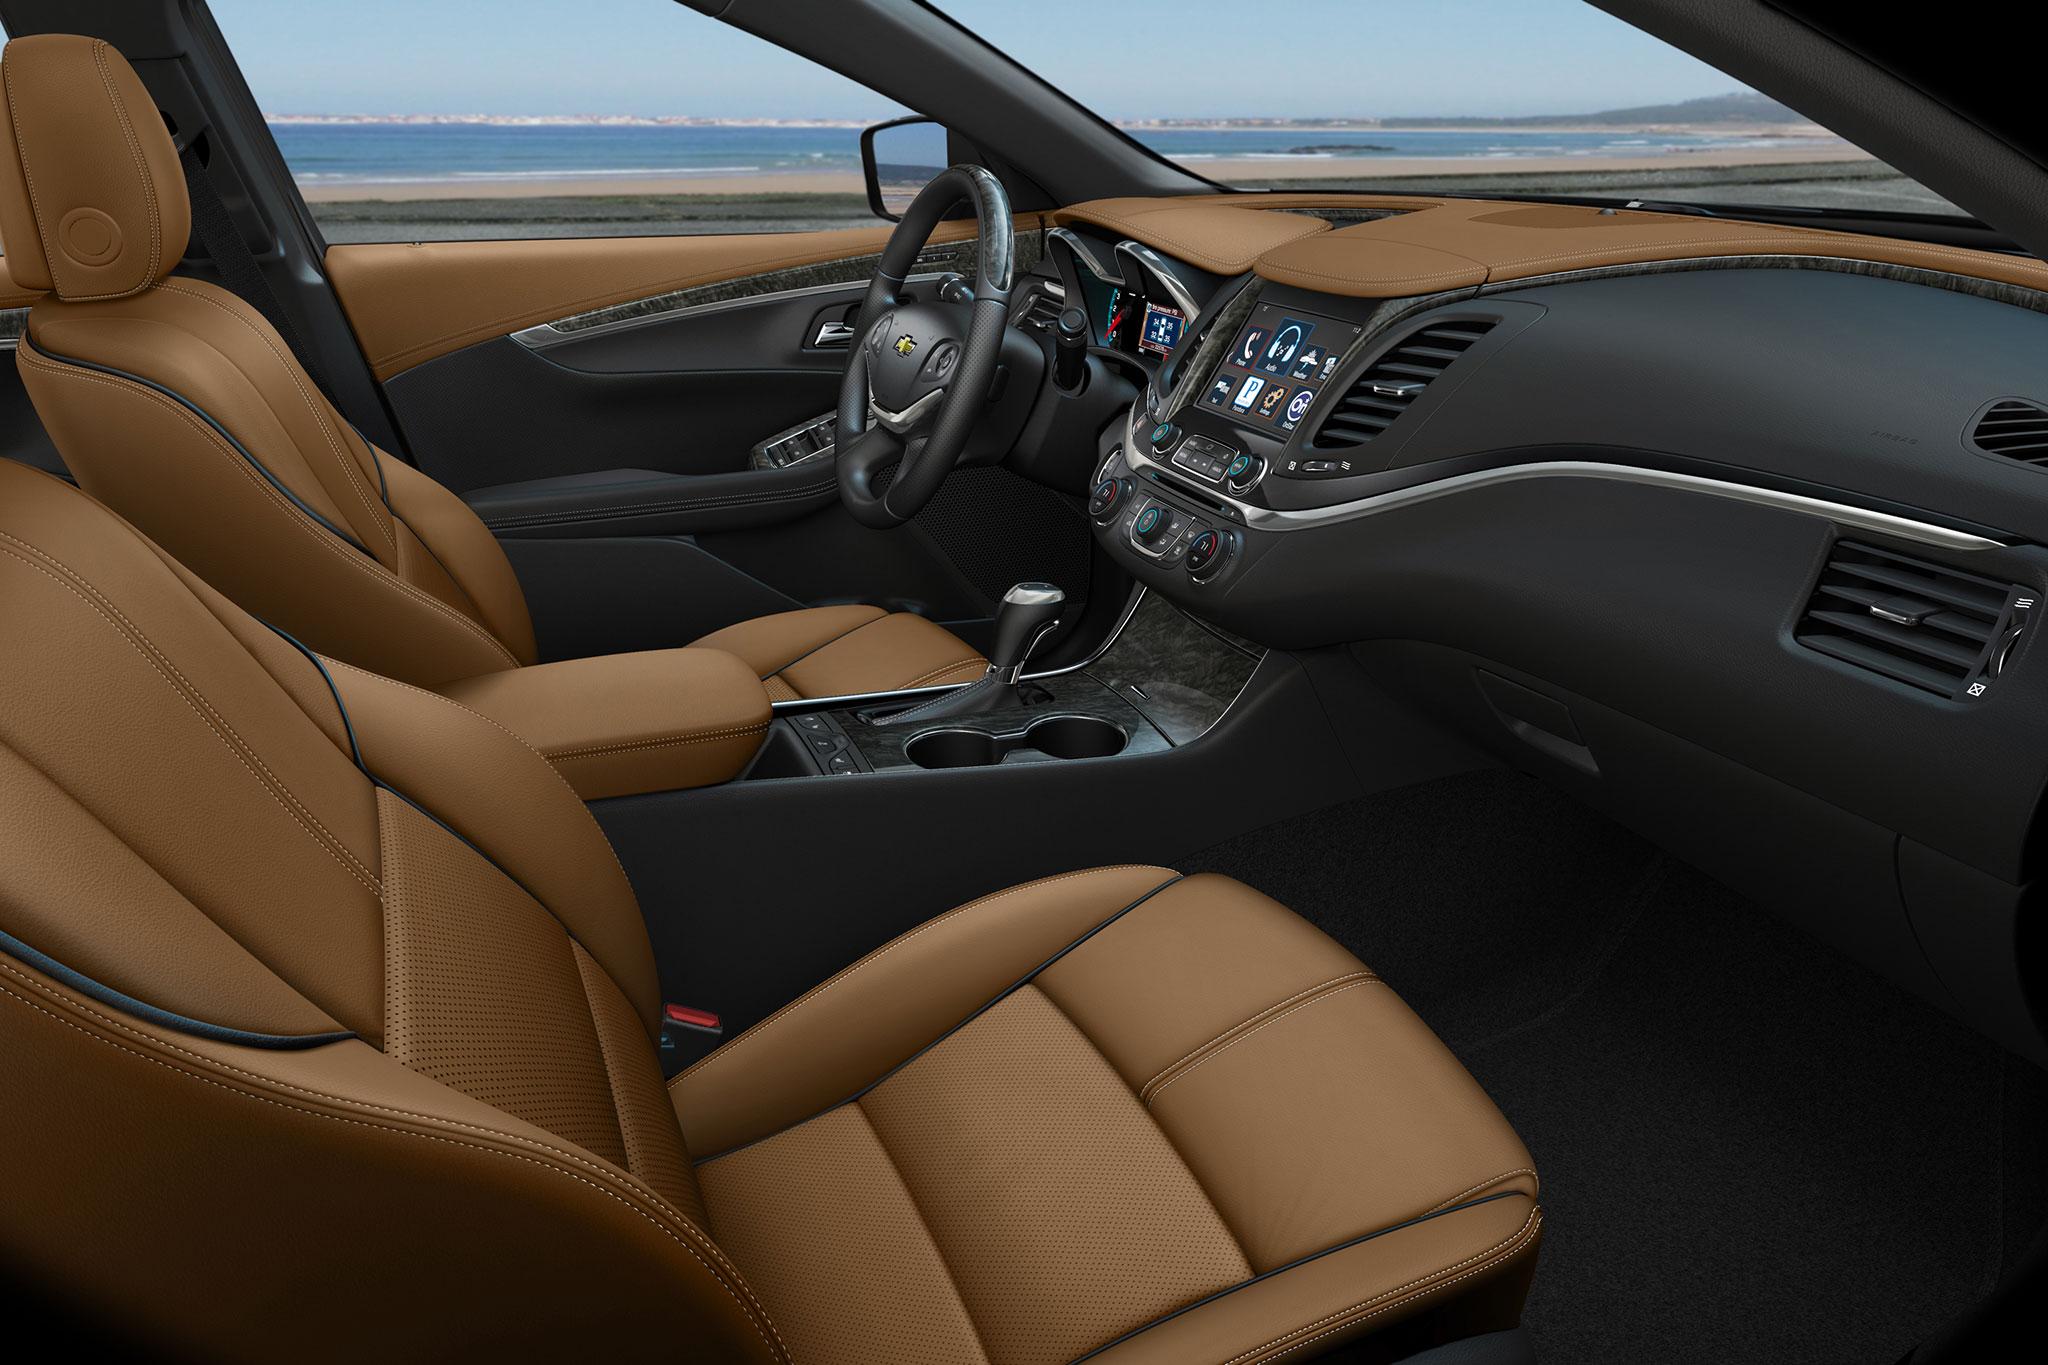 2014 chevrolet impala 2.5 1lt first drive - automobile magazine